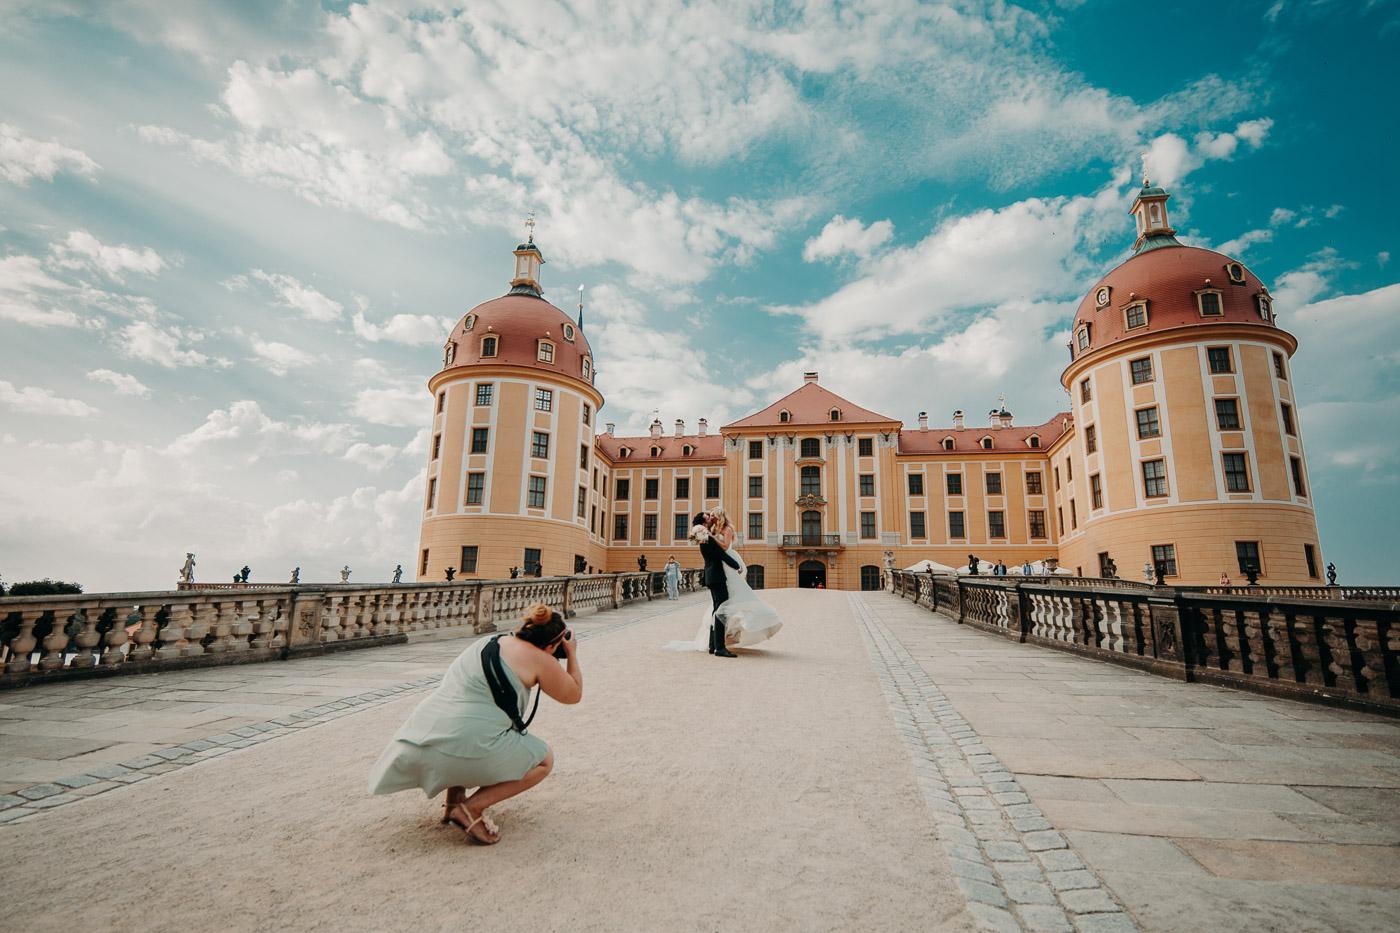 Hochzeitsfotograf Dresden Radebeul Schloss Moritzburg